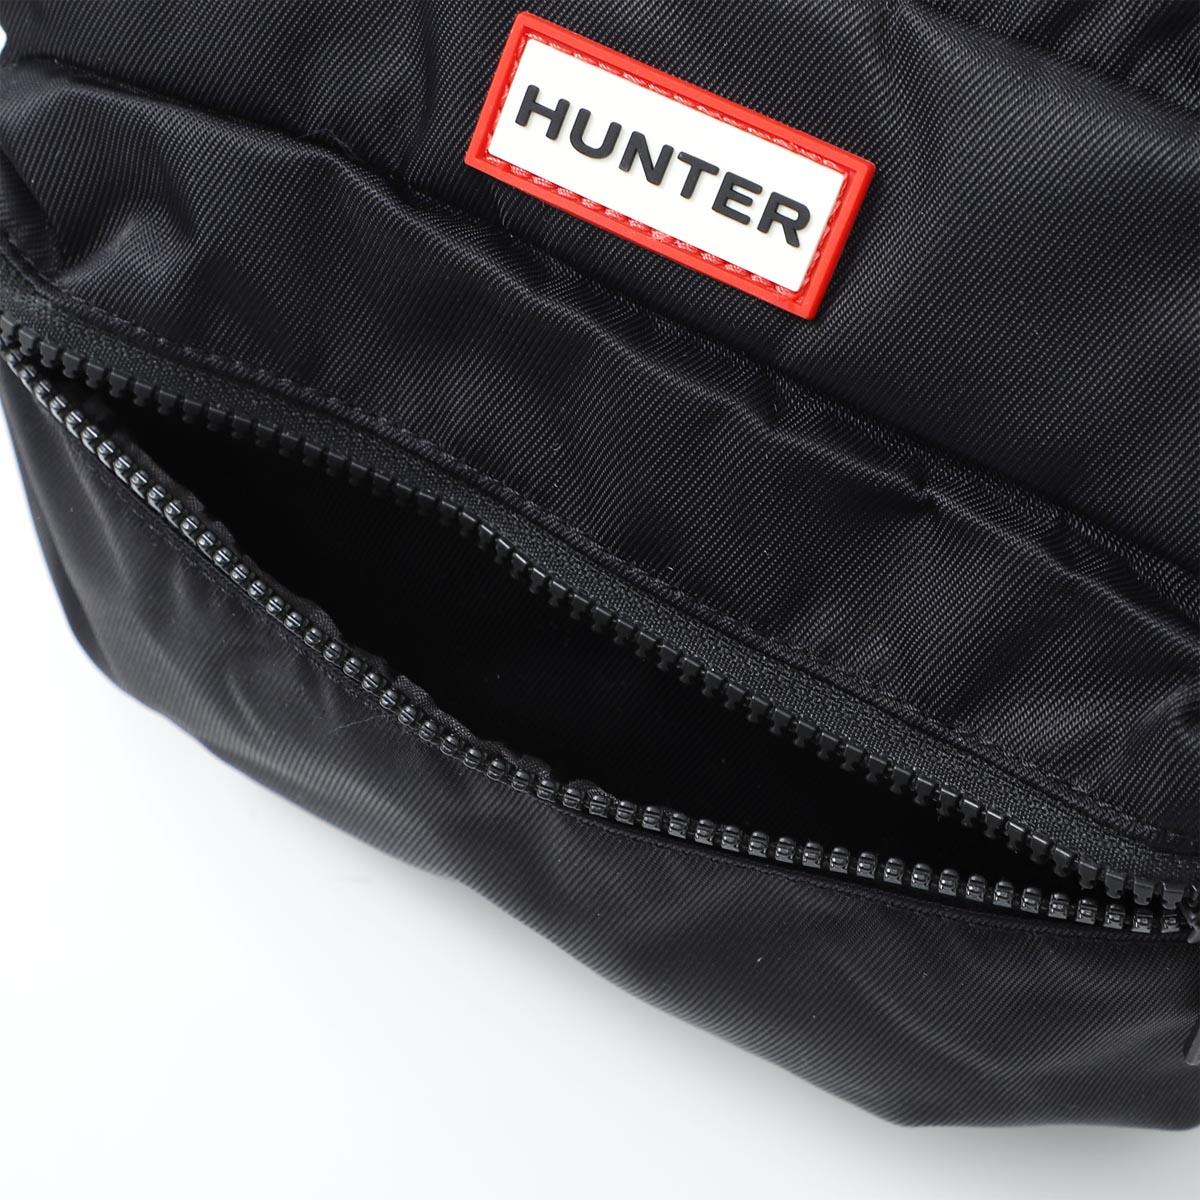 HUNTER ハンター クロスボディバッグ/ORIGINAL NYLON CROSSBODY BUMBAG メンズ